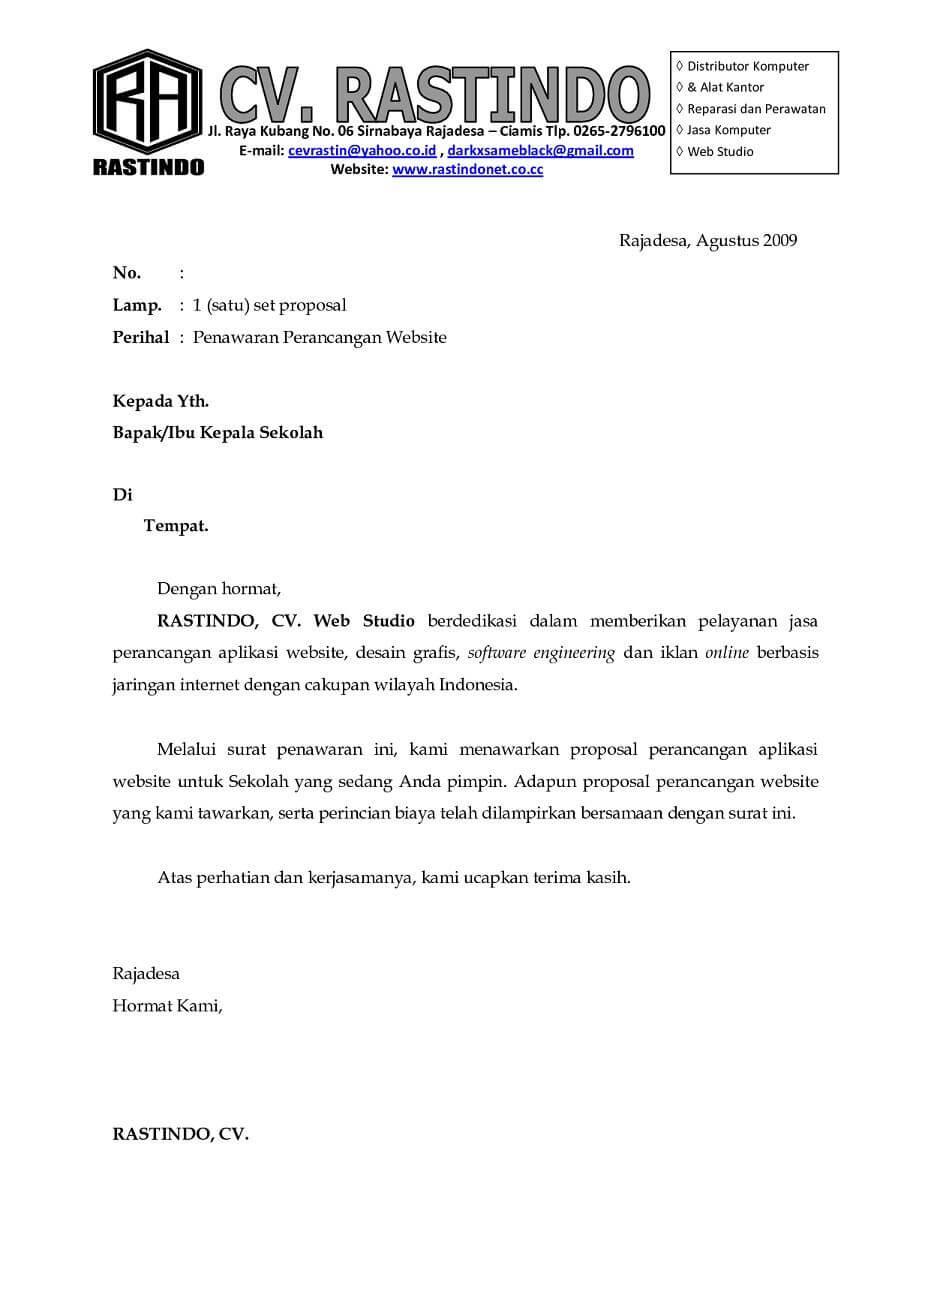 Contoh Surat Penawaran Kerjasama  Assalam Print